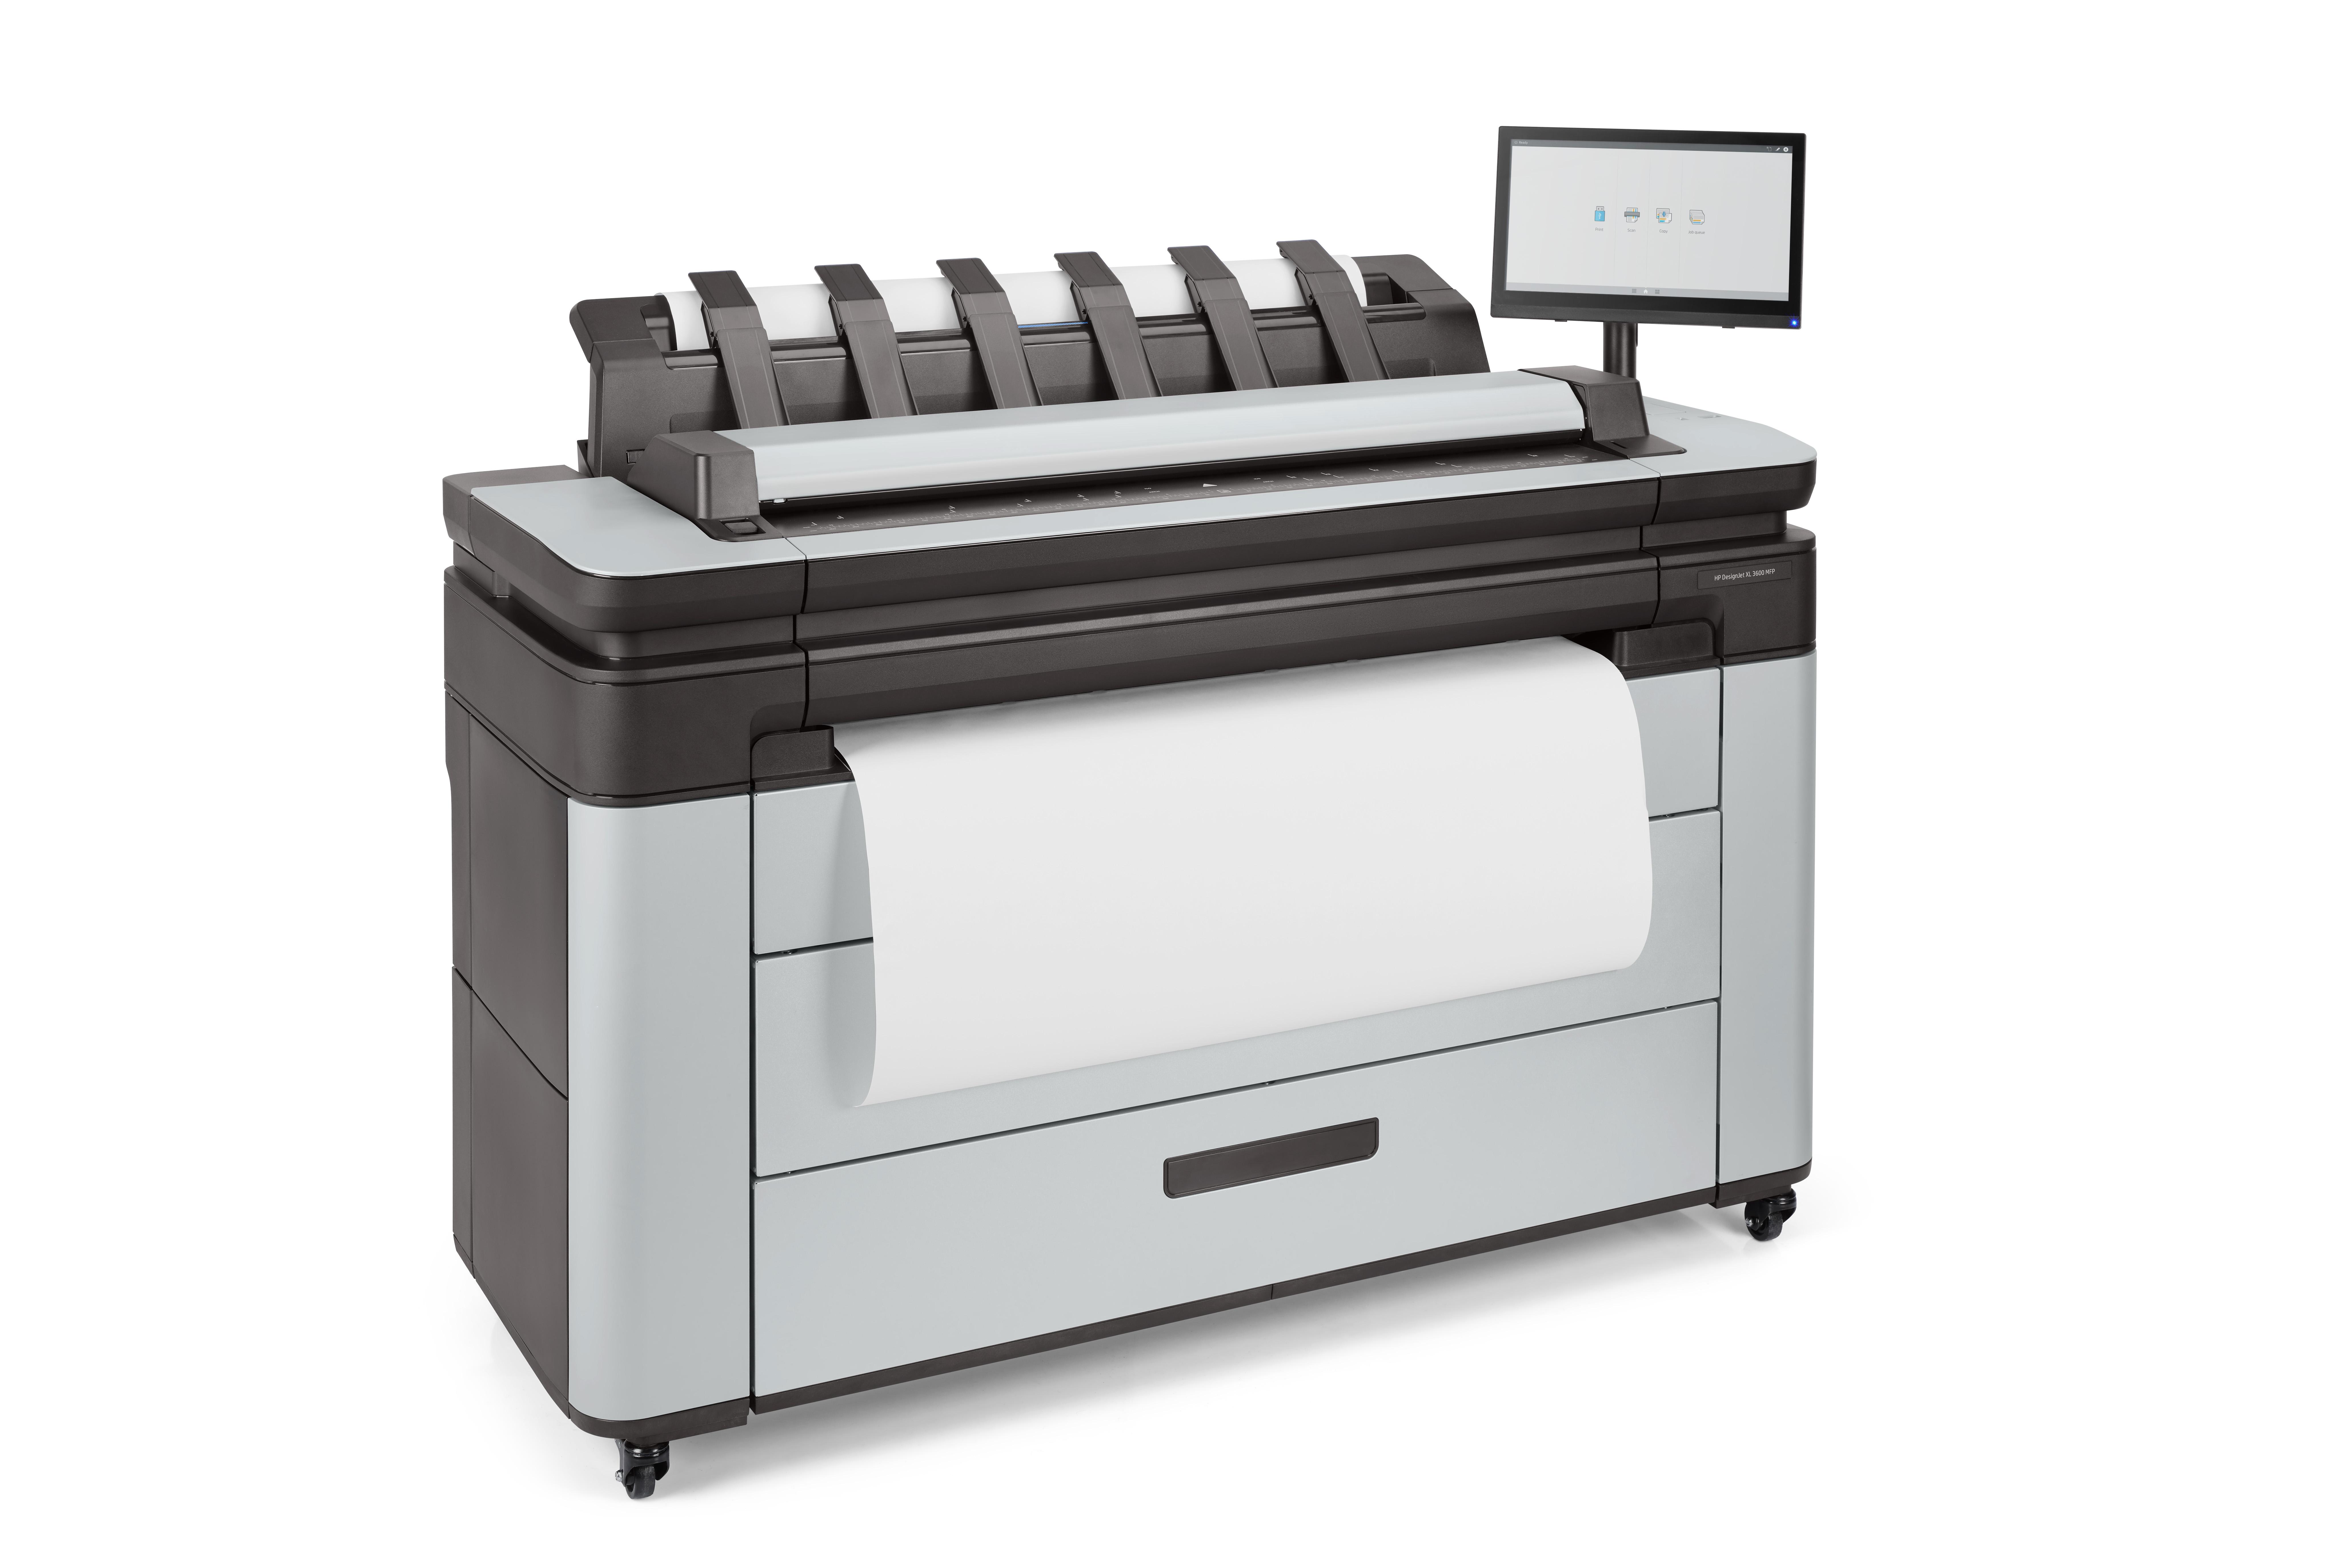 Imprimante multifonction HP DesignJet XL 3600